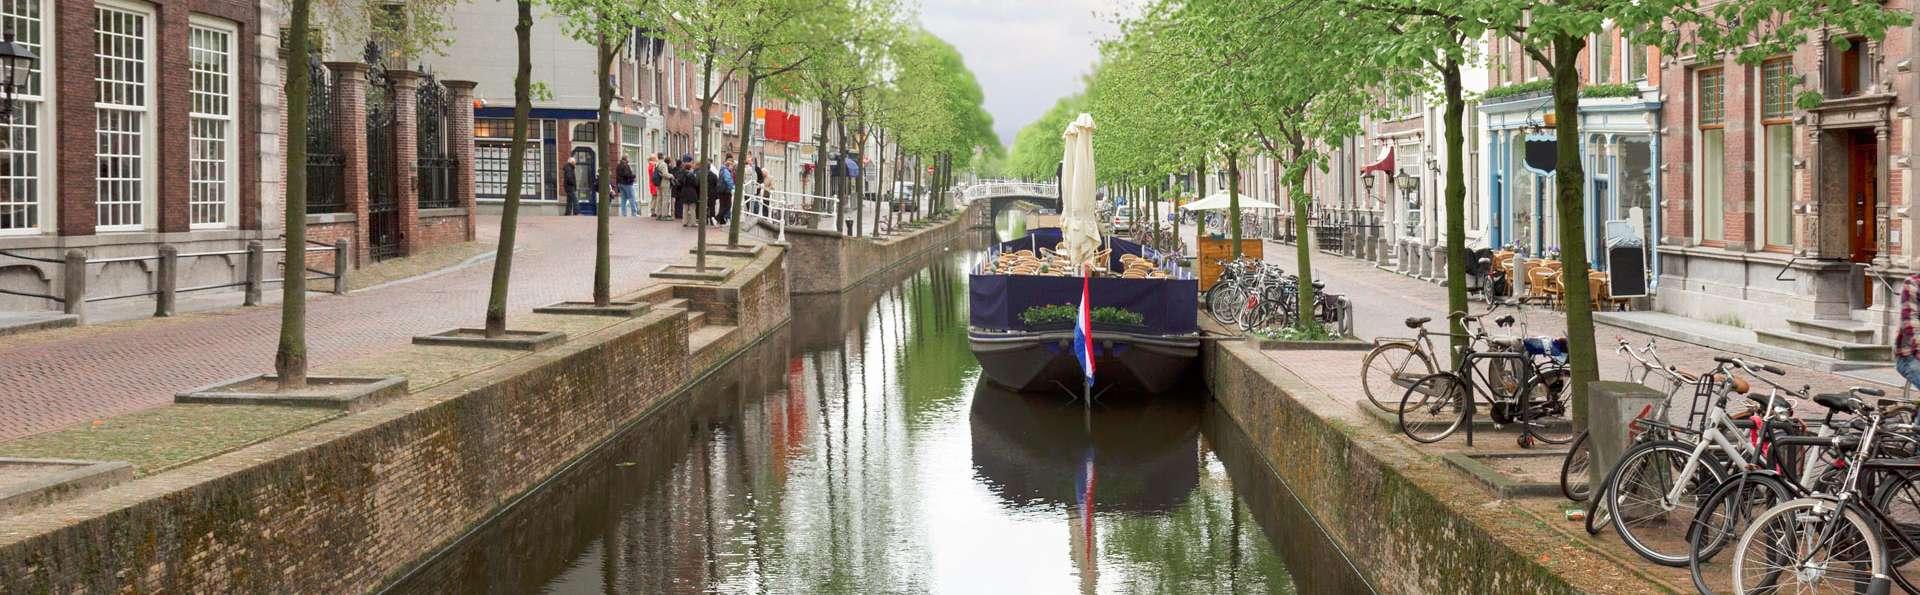 Ibis Styles Delft City Centre - EDIT_DELFT_01.jpg